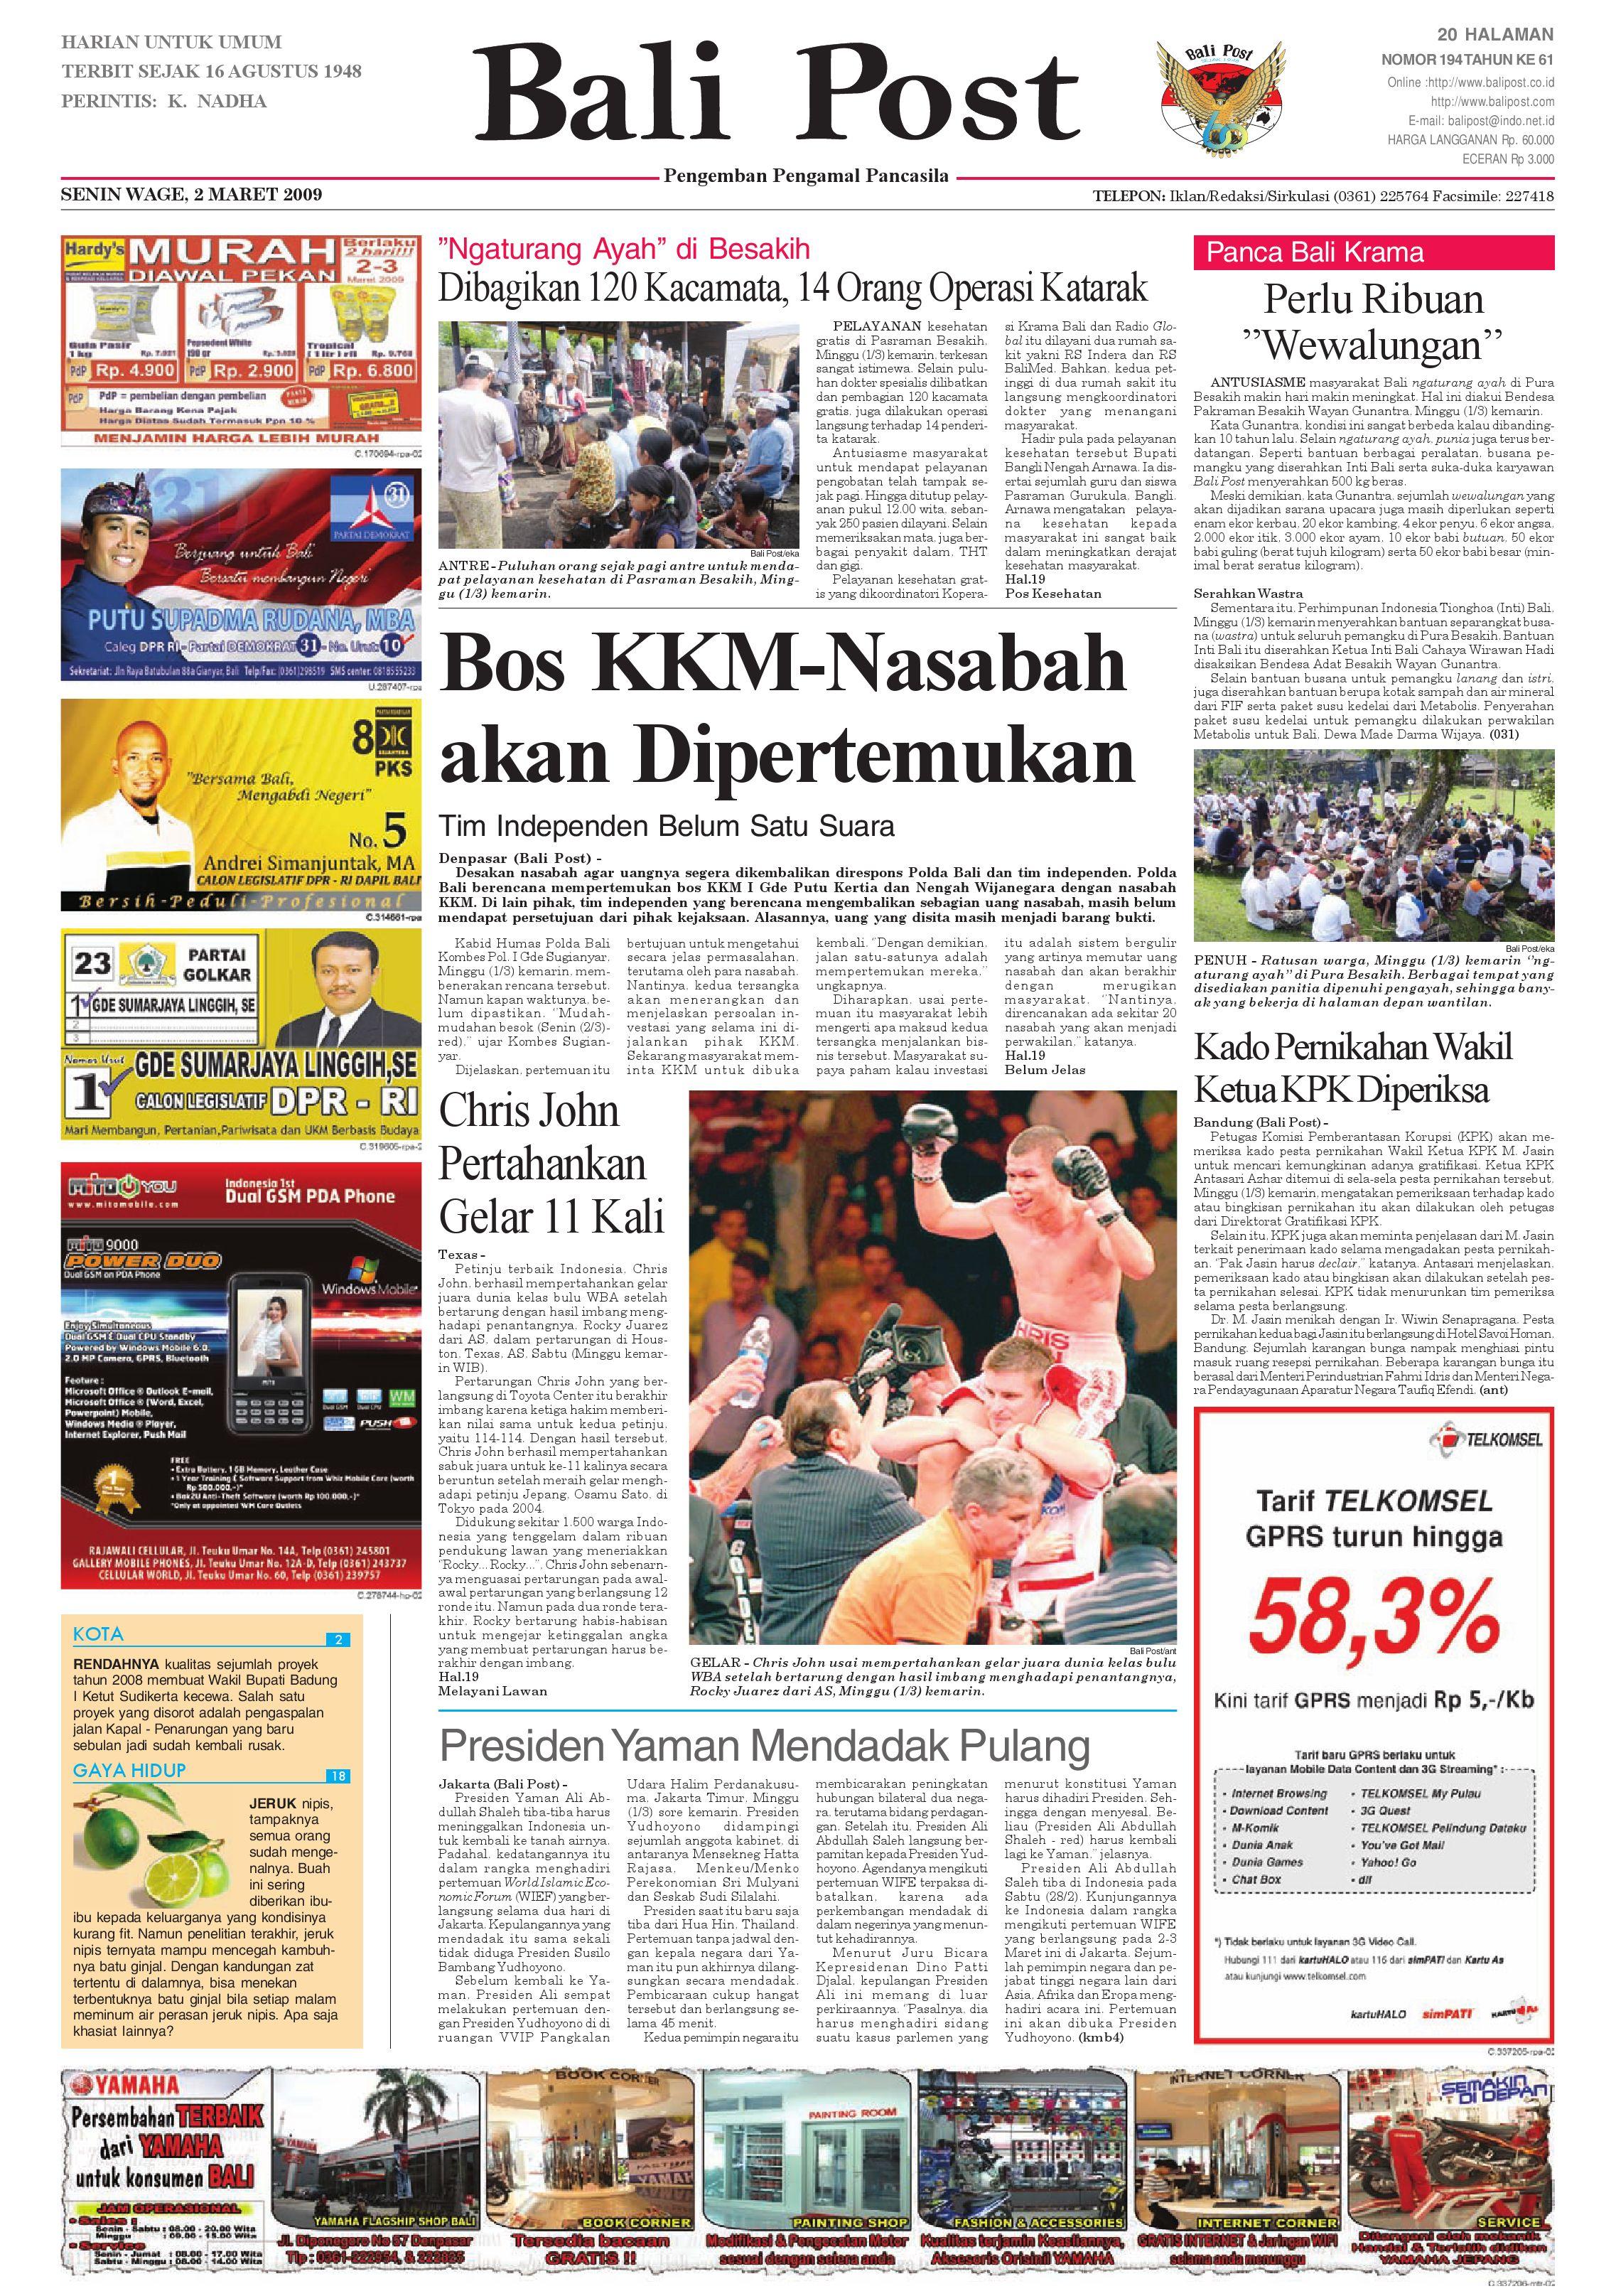 Bali Post Senin 27 April 2009 By E Paper Kmb Issuu # Muebles Nuryan San Luis Potosi